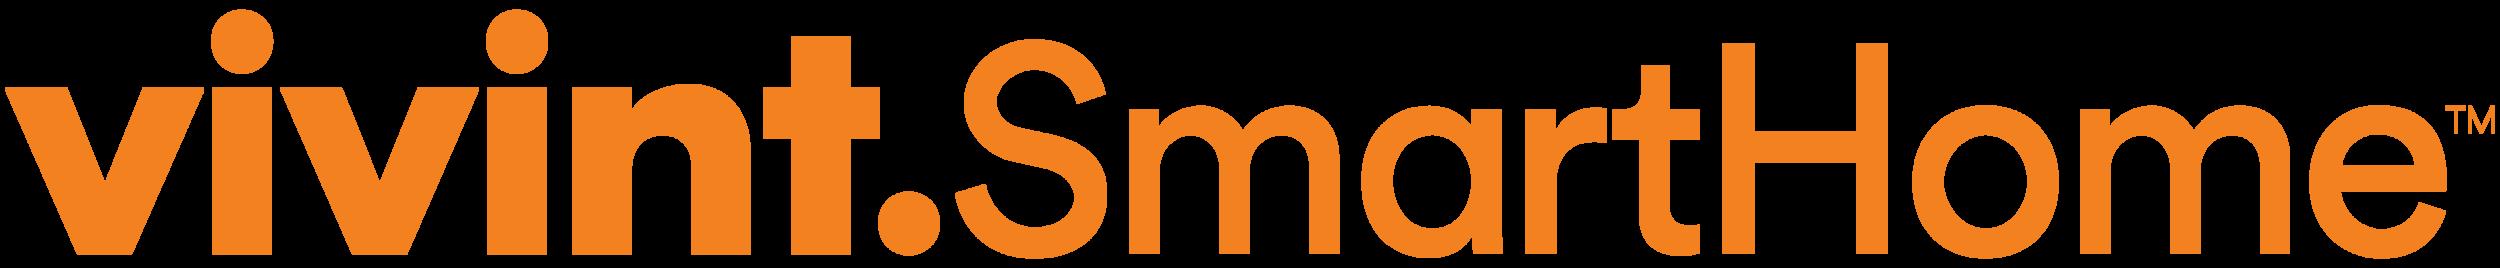 Vivint Smart Home Logo_Secondary_Orange.png